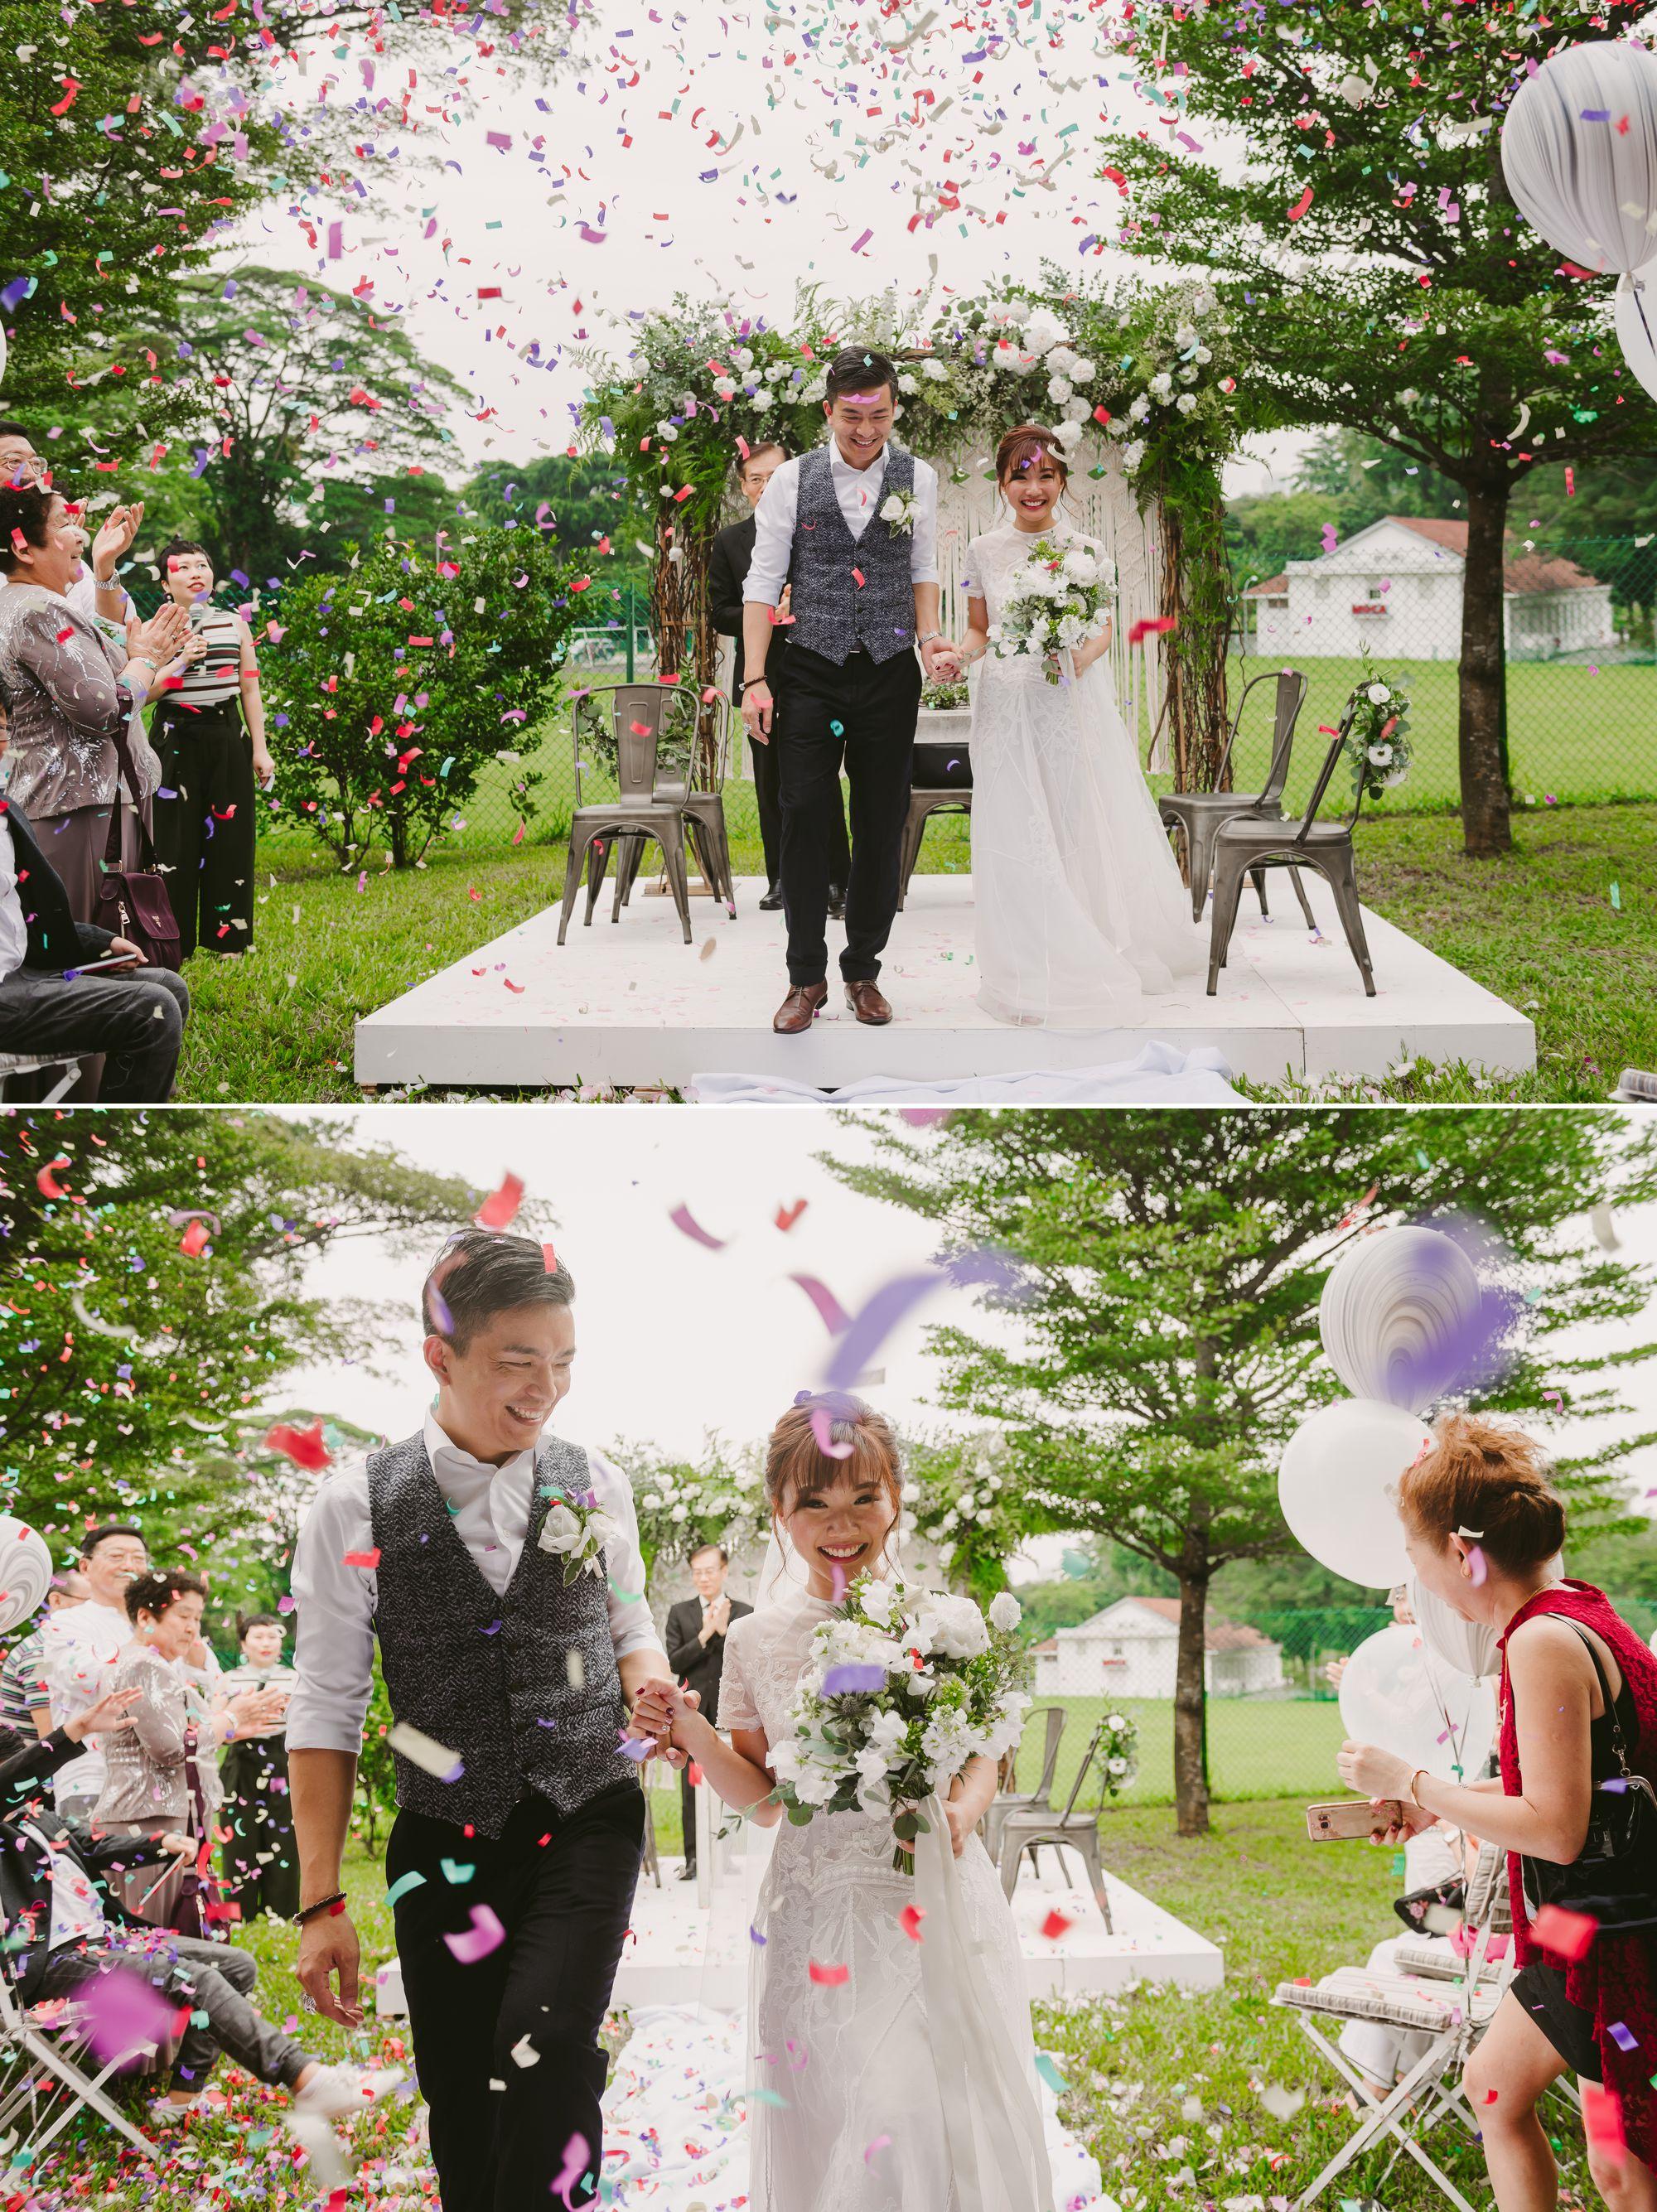 wedding_photography 20.jpg